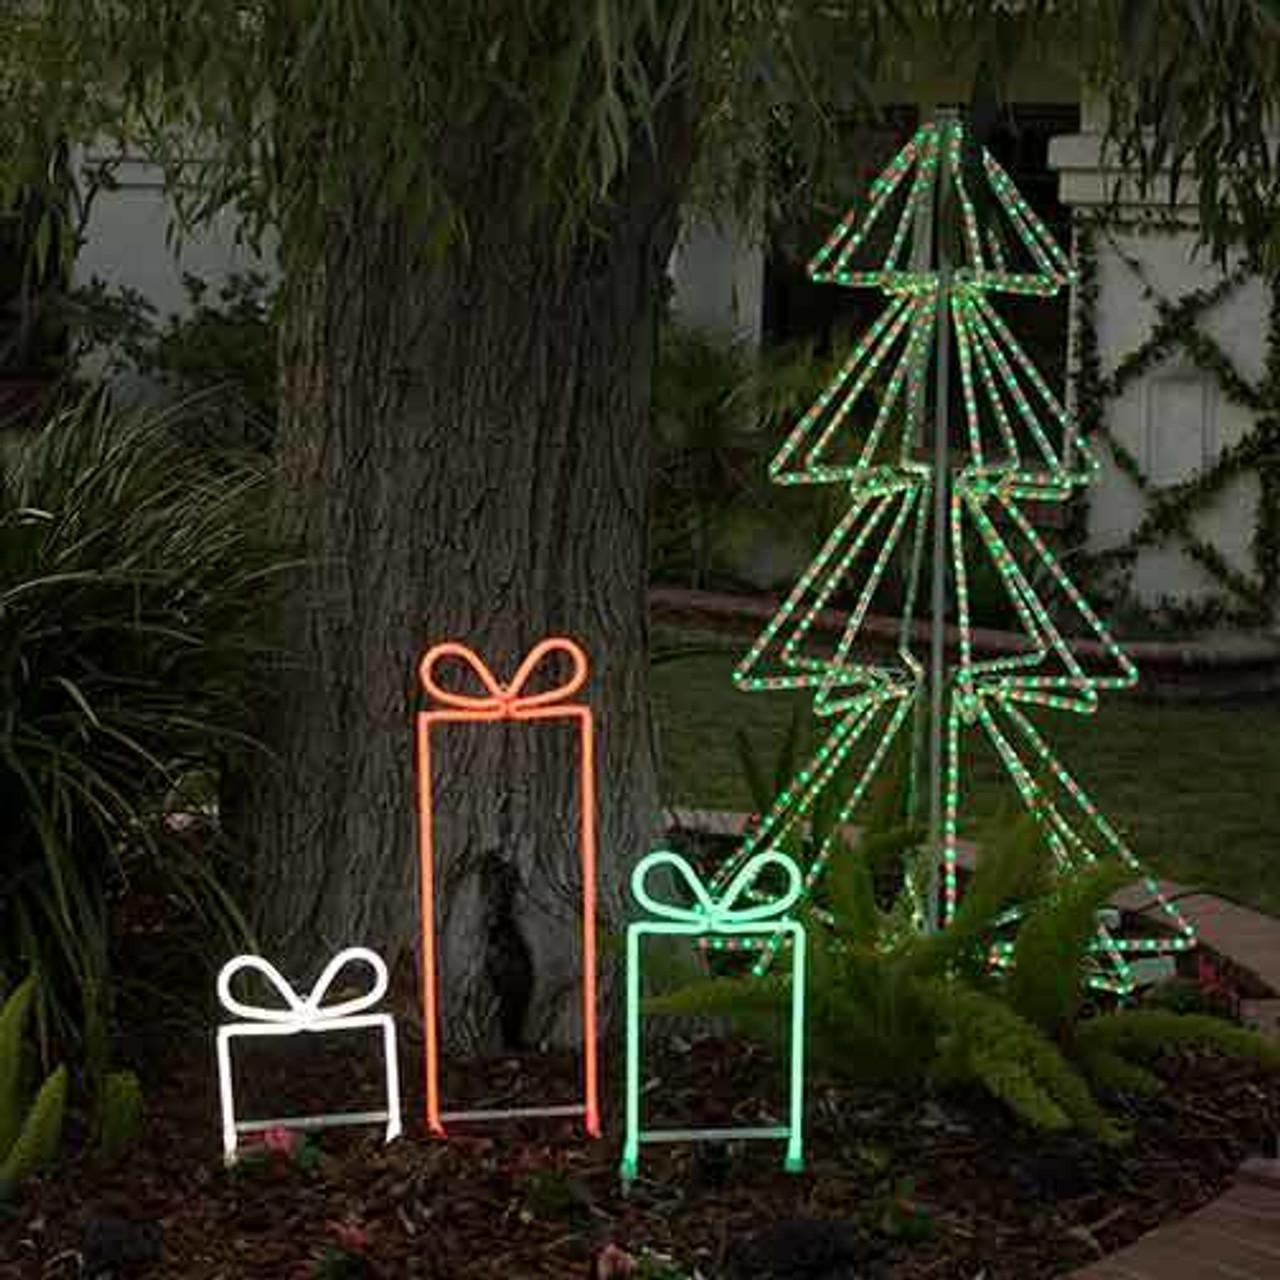 Rope Light Motif Kits